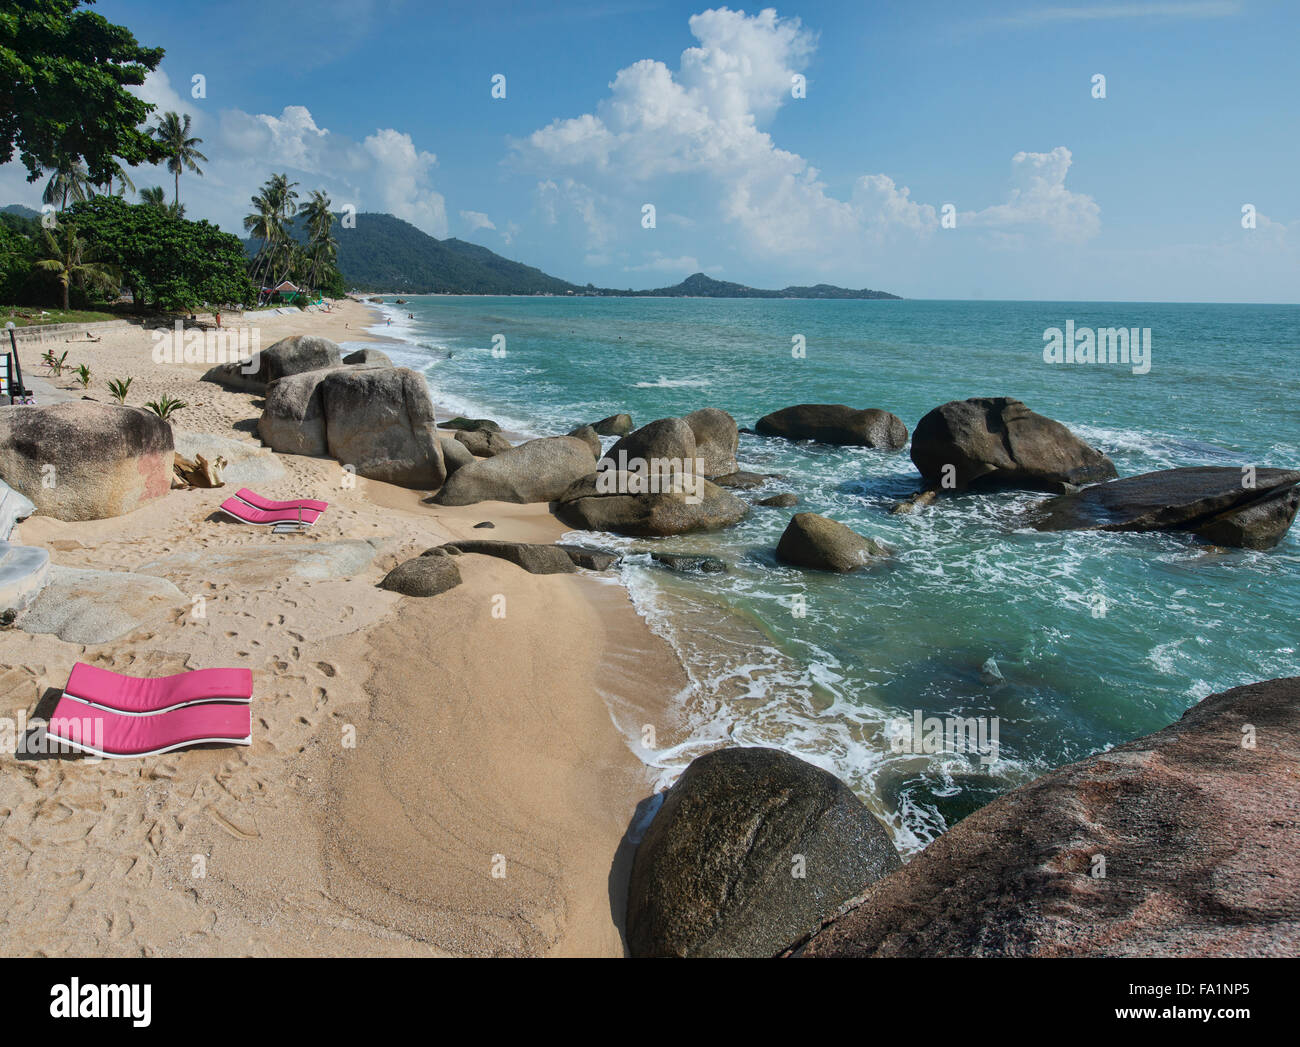 A lo largo de la playa de Lamai en isla de Koh Samui, Tailandia Foto de stock